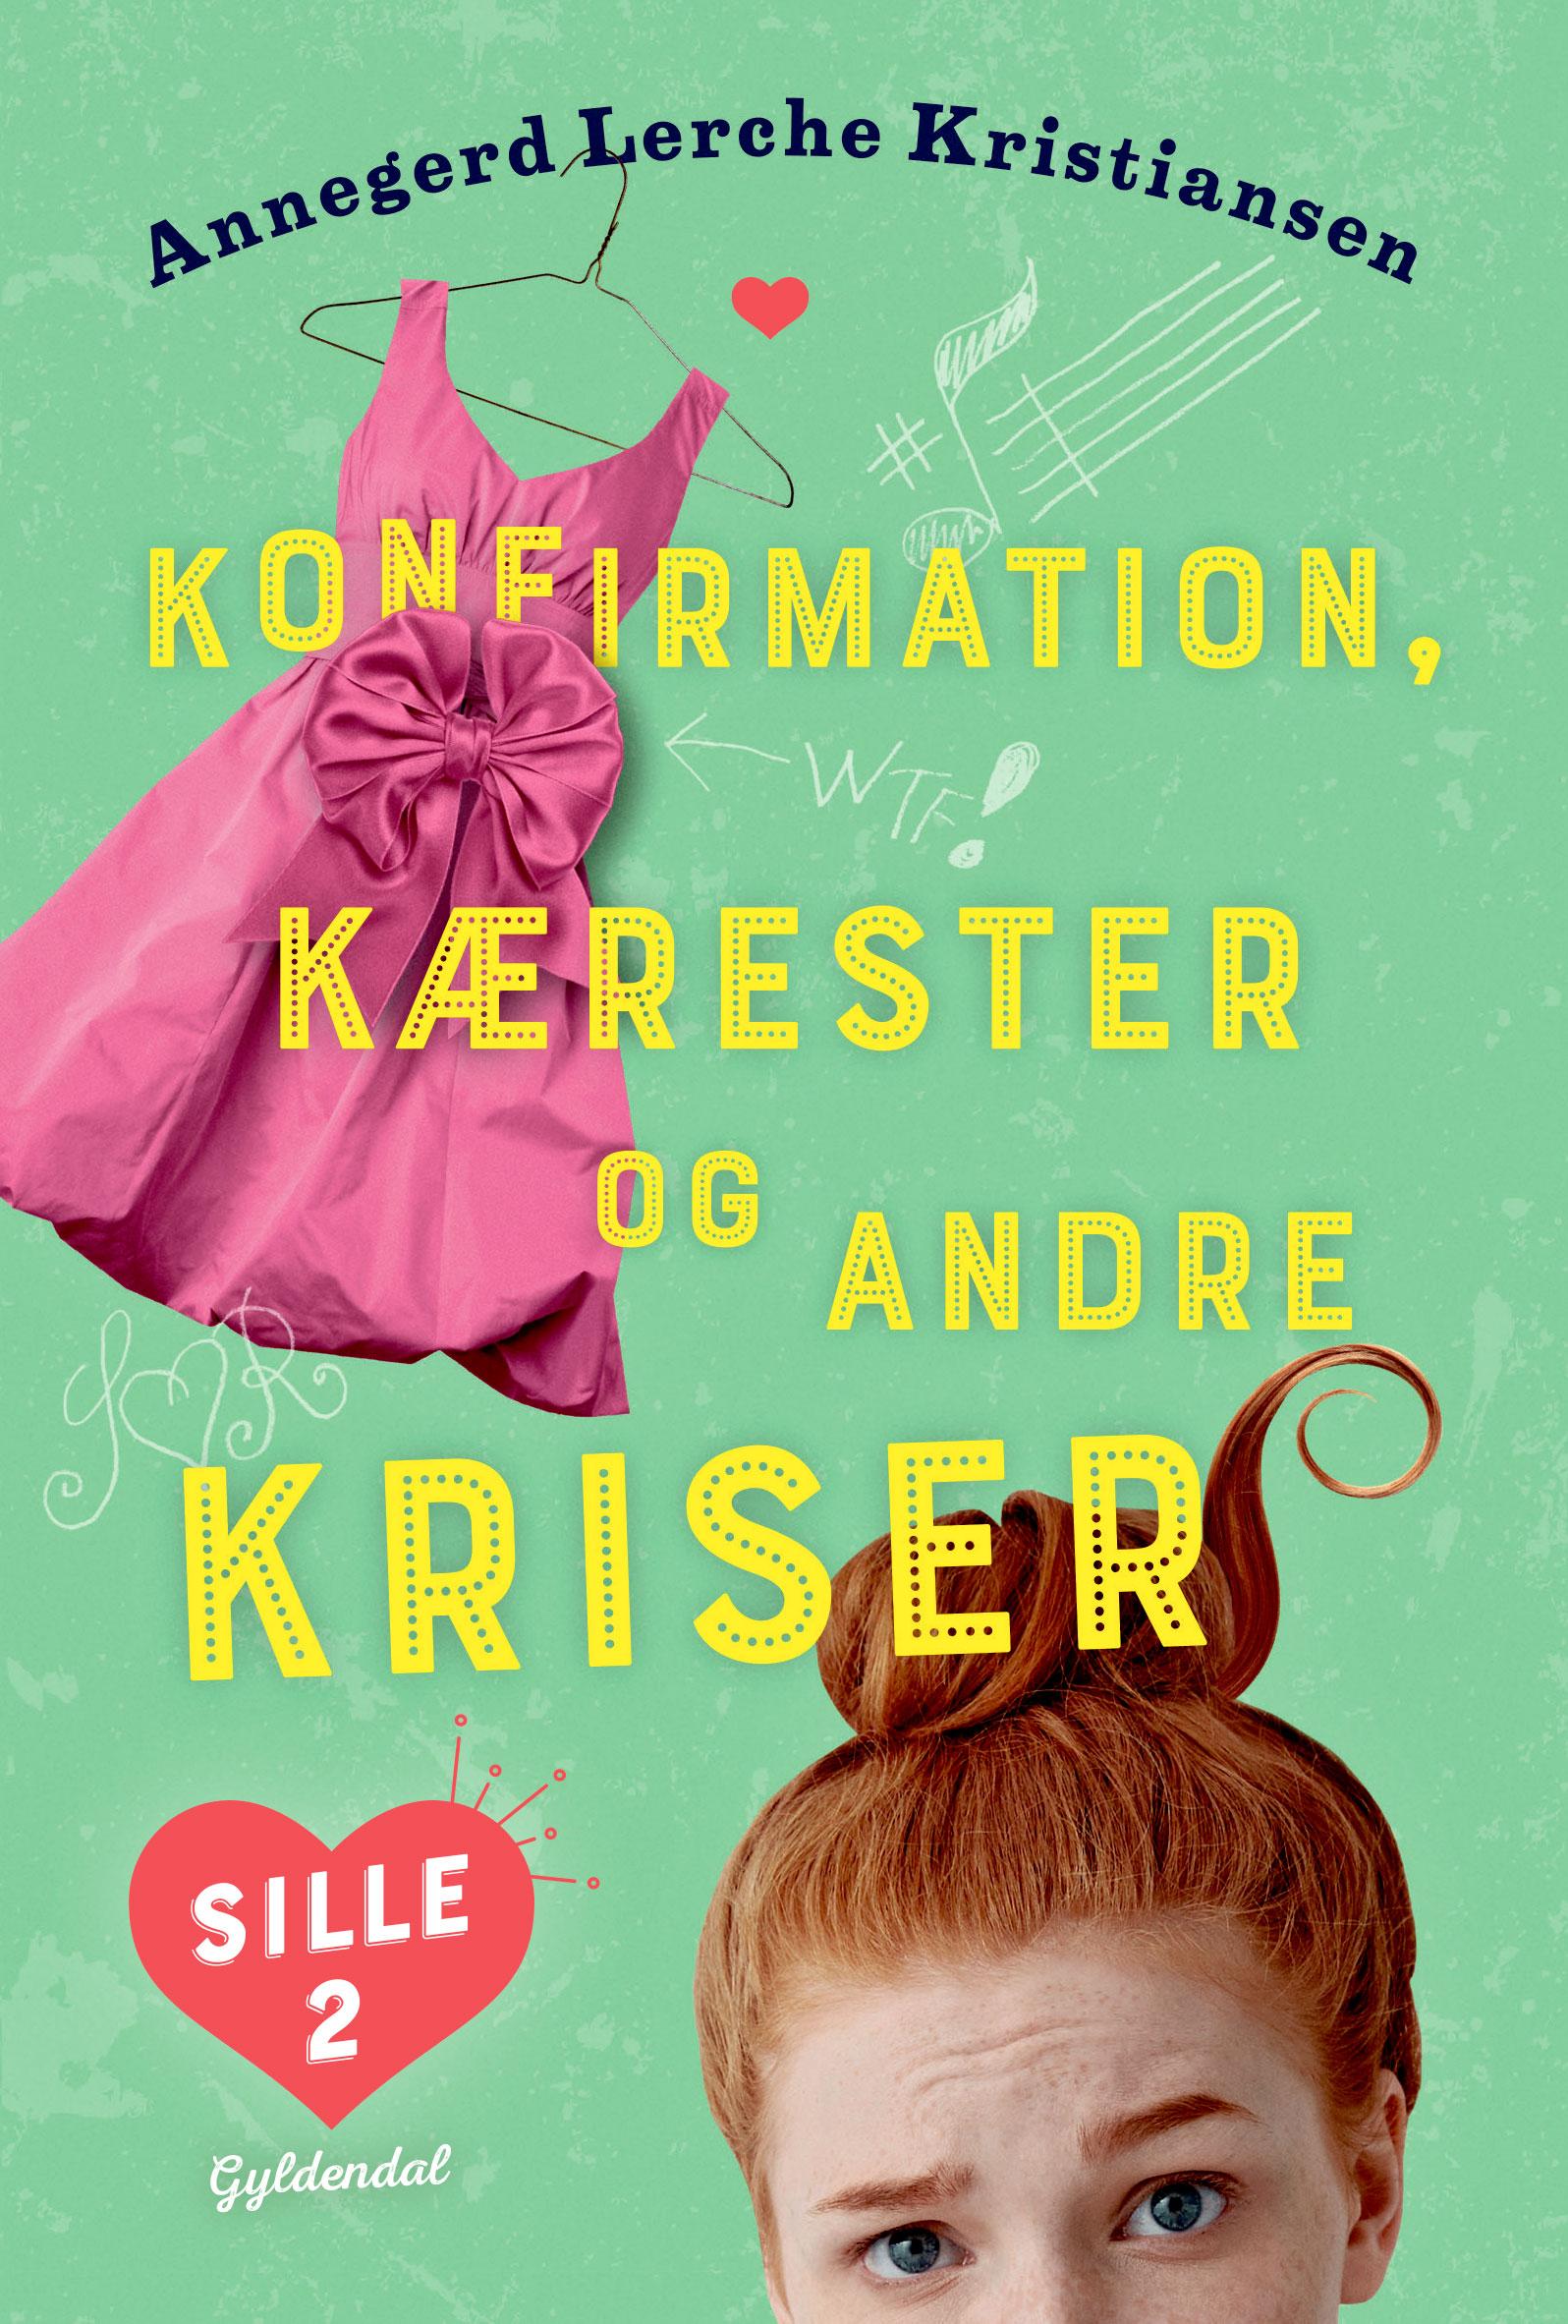 Sille: Sille 2 - Konfirmation, kærester og andre kriser - Annegerd Lerche Kristiansen - Bøger - Gyldendal - 9788702289305 - 16/1-2020